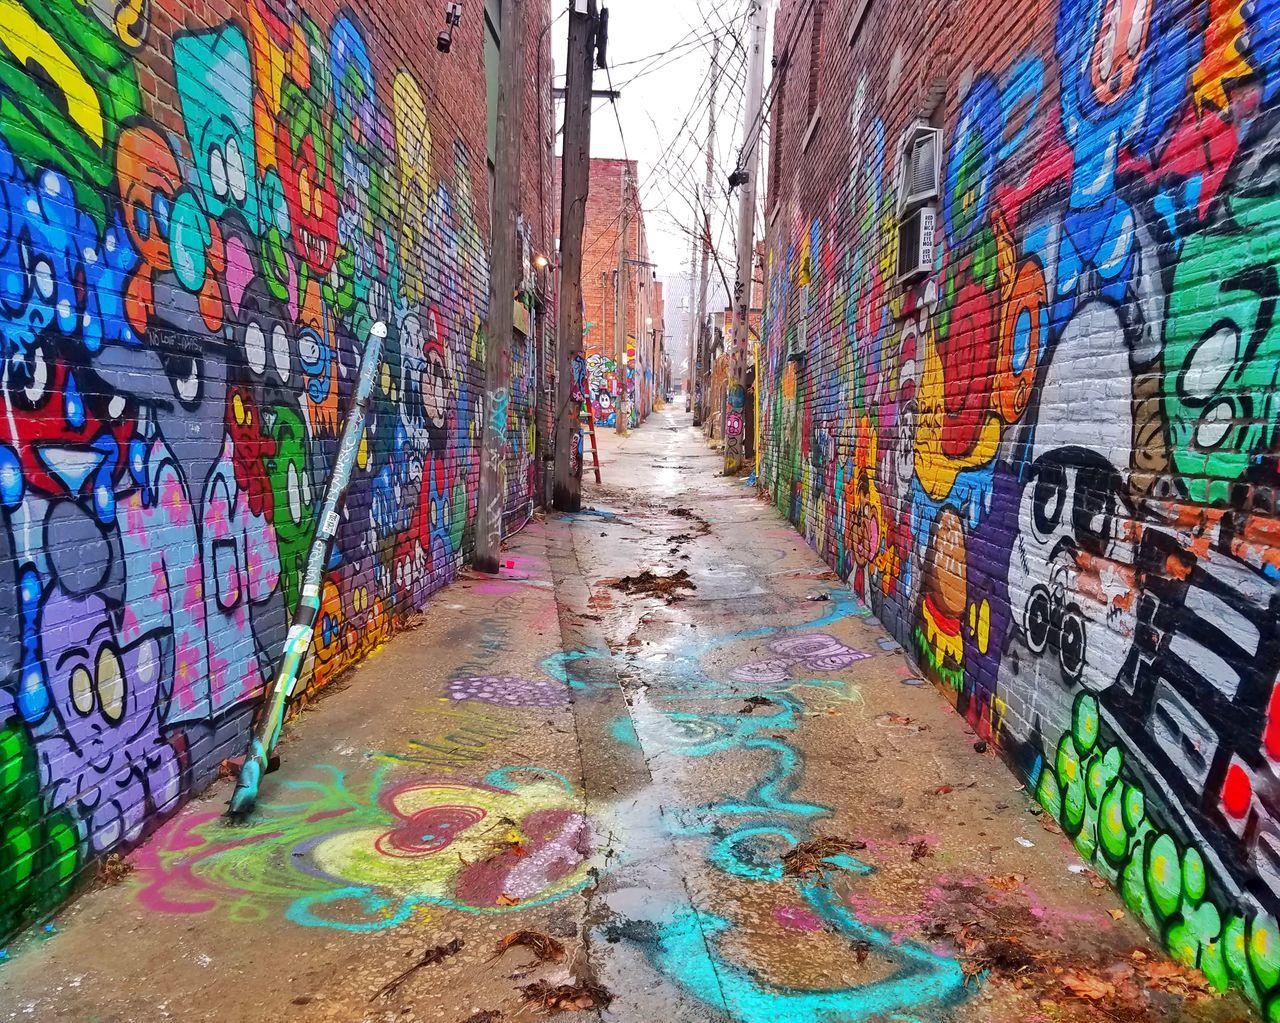 Multi Colored Graffiti Wall - Building Feature Street Art Creativity City Day Outdoors Building Exterior Spray Paint No People Architectural Detail Kansas City Illuminated Kansas Kansasmag Crossroads Crossroadskc